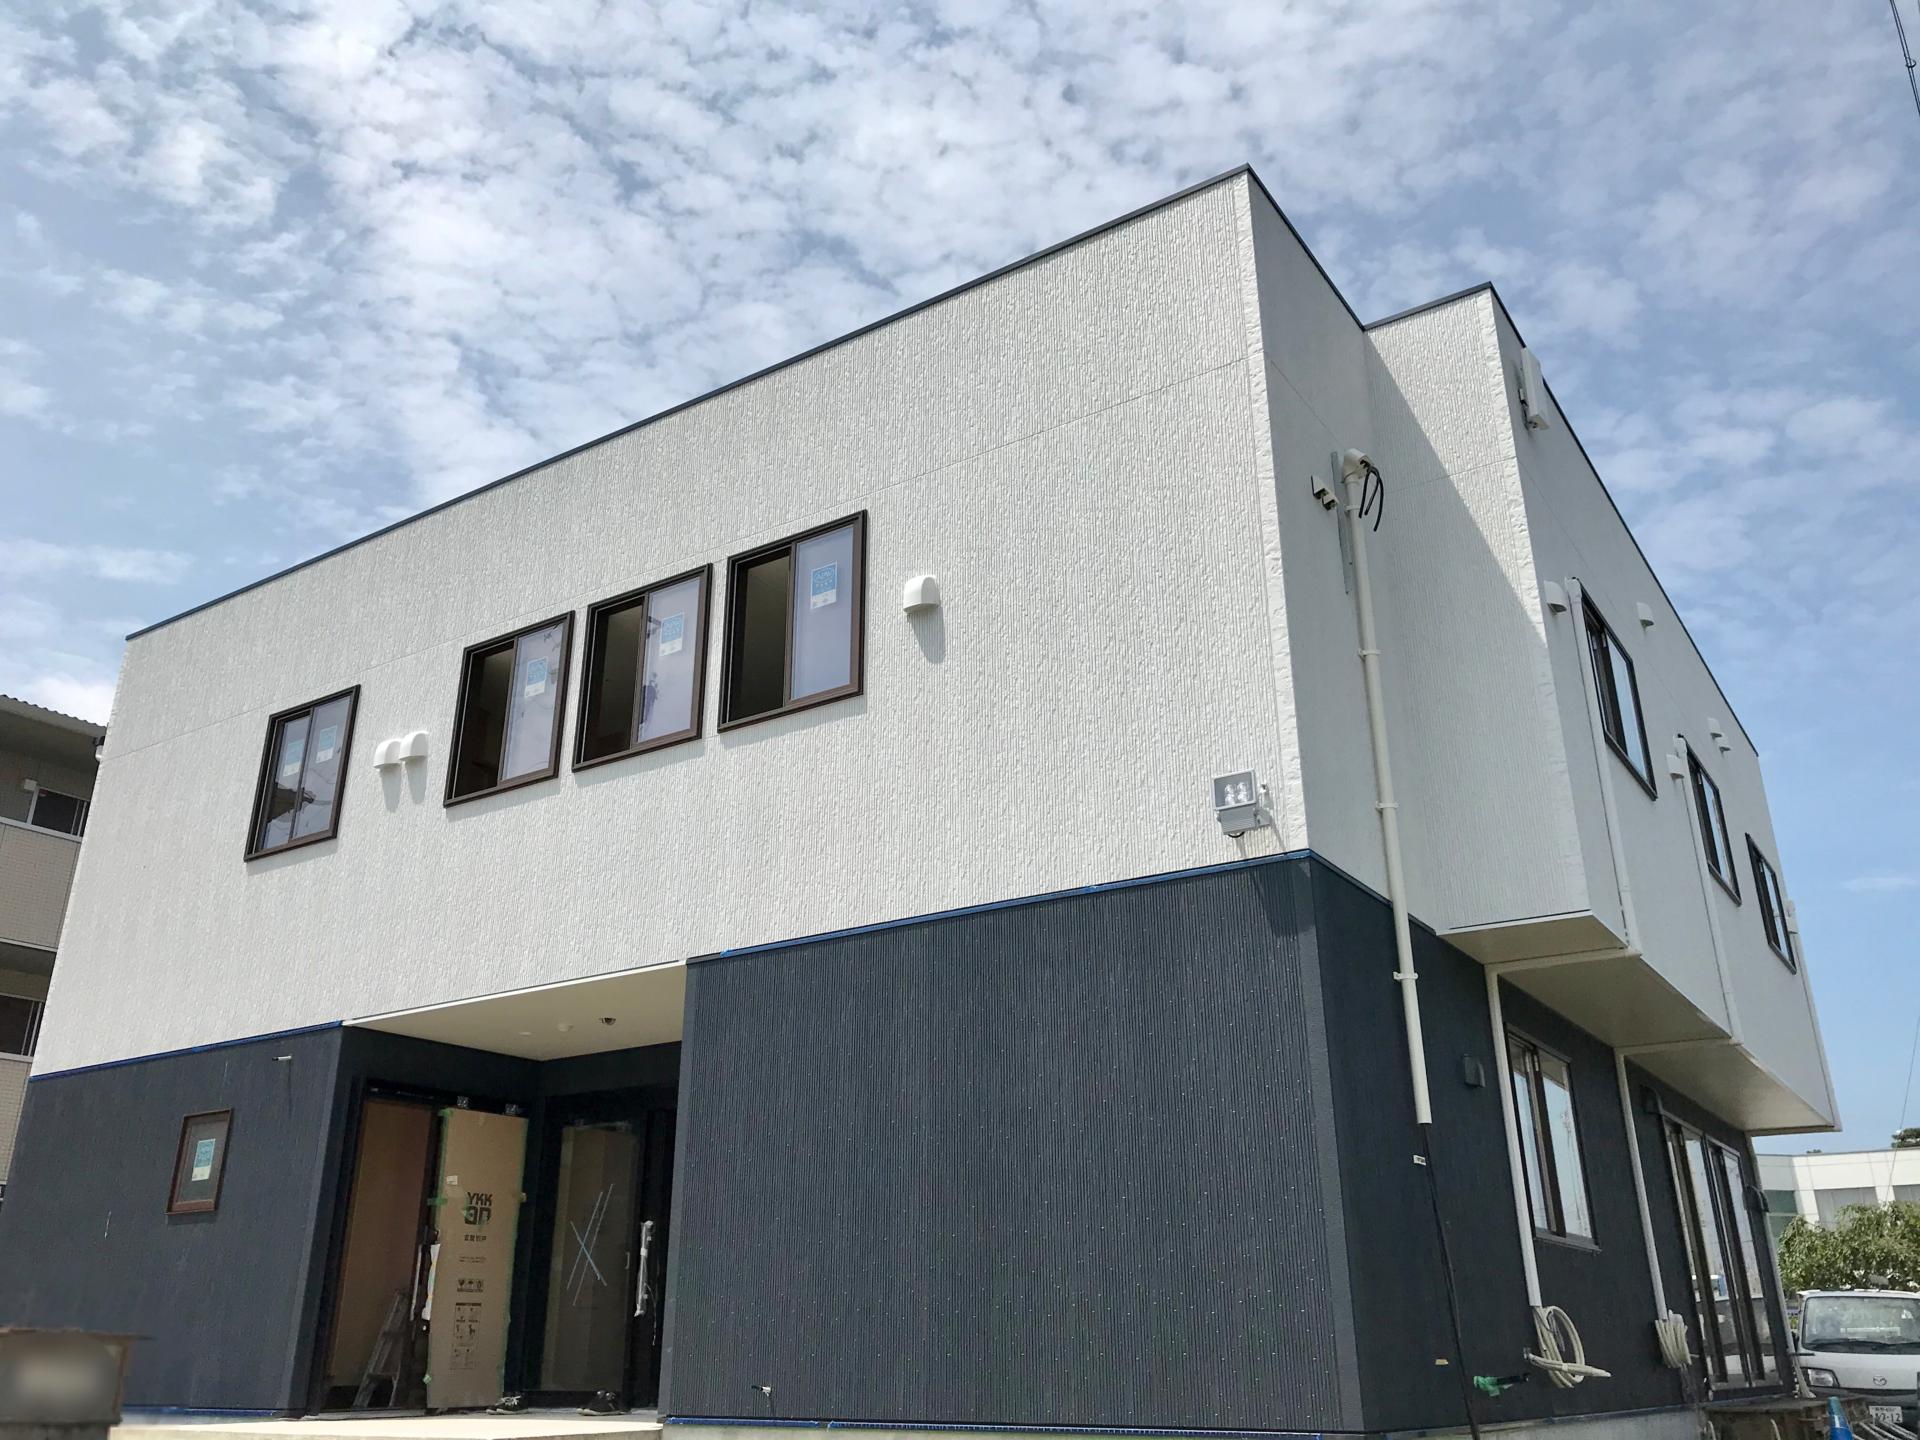 ■正社員 2021年2月1日 長野市下氷鉋にオープン!【小規模多機能型居宅介護】